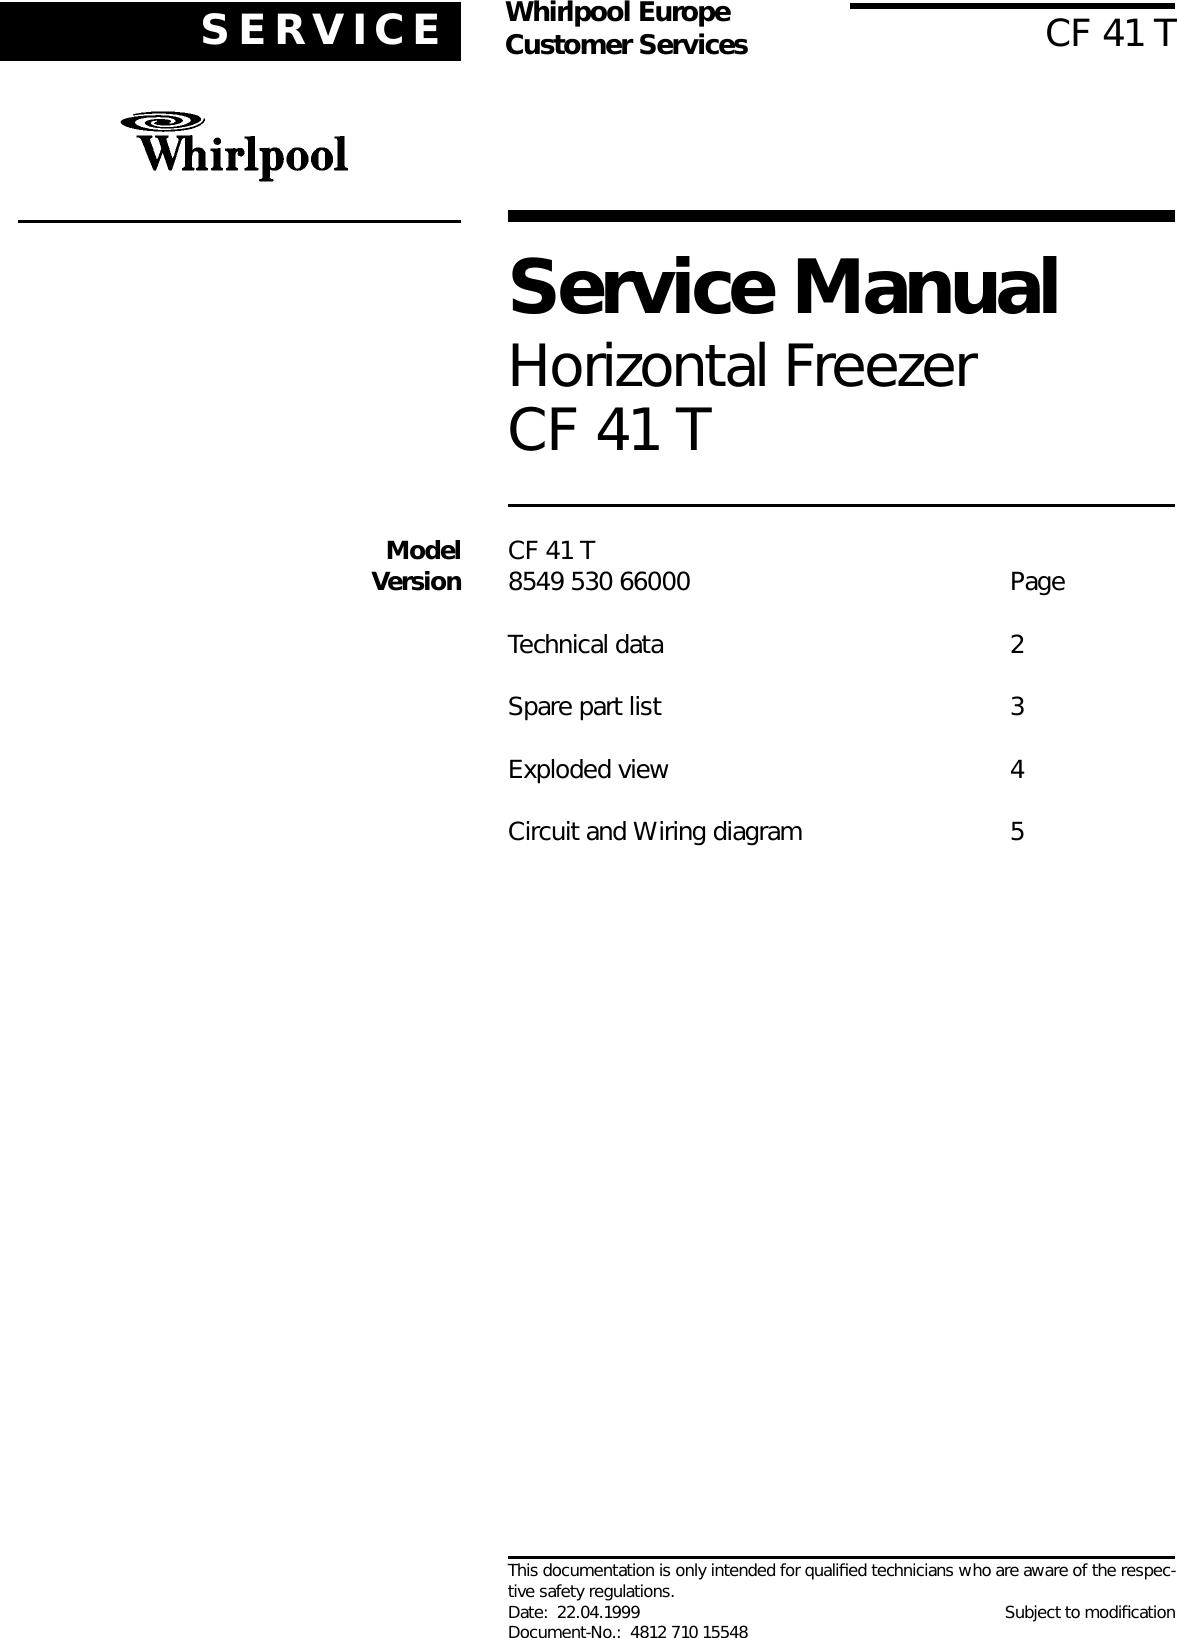 Whirlpool Freezer 41 Users Manual Cf Wiring Diagrams